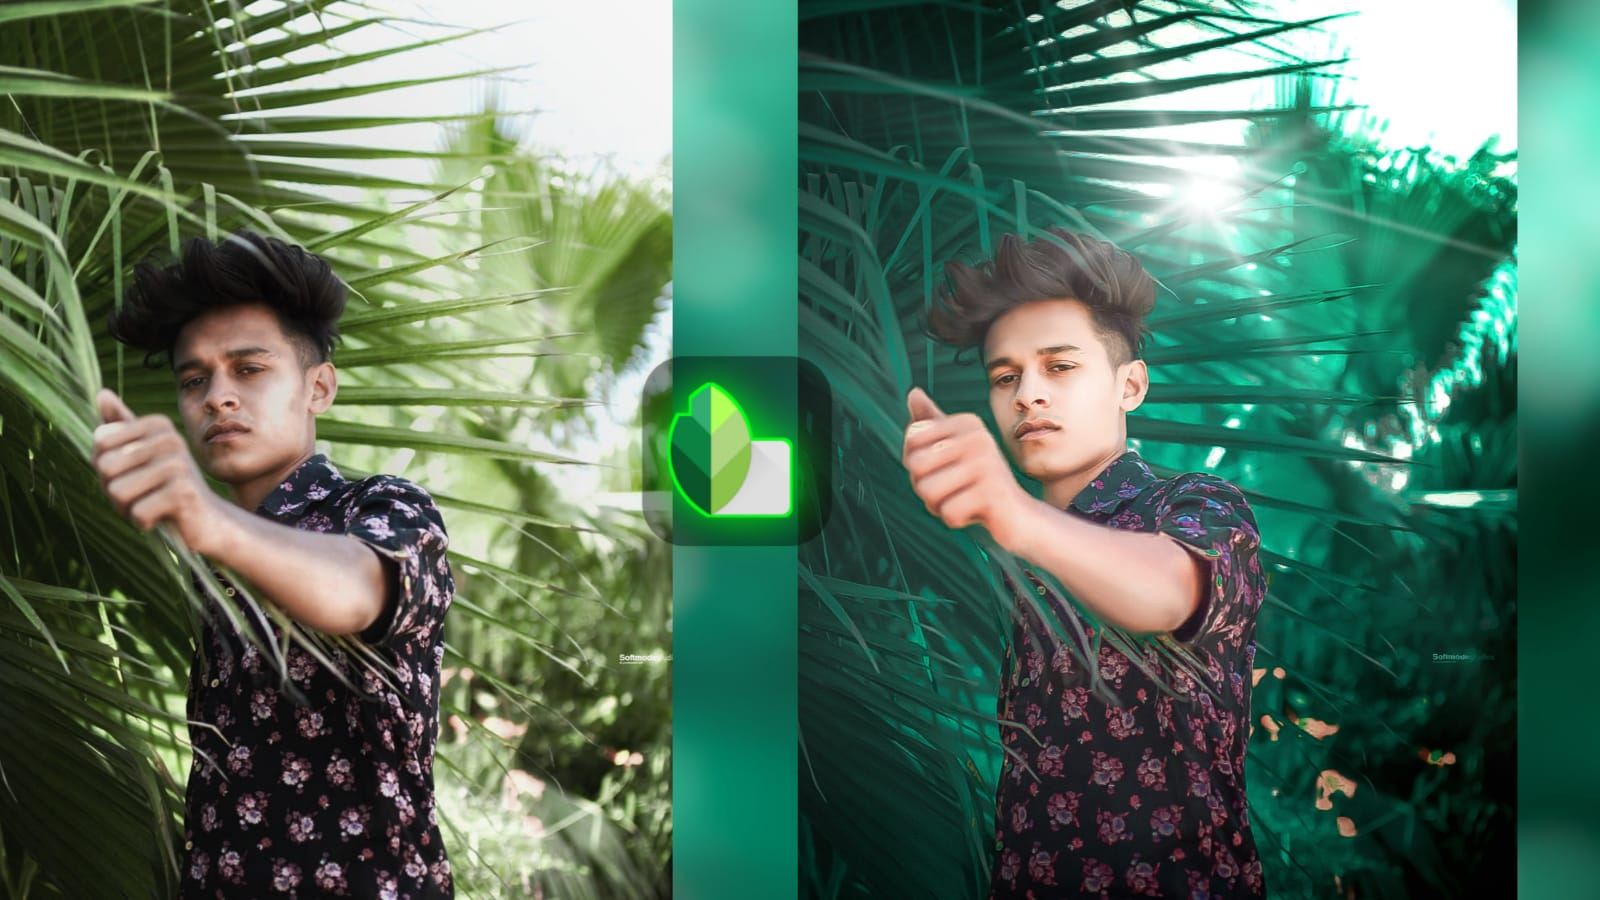 Lightroom Photo editing